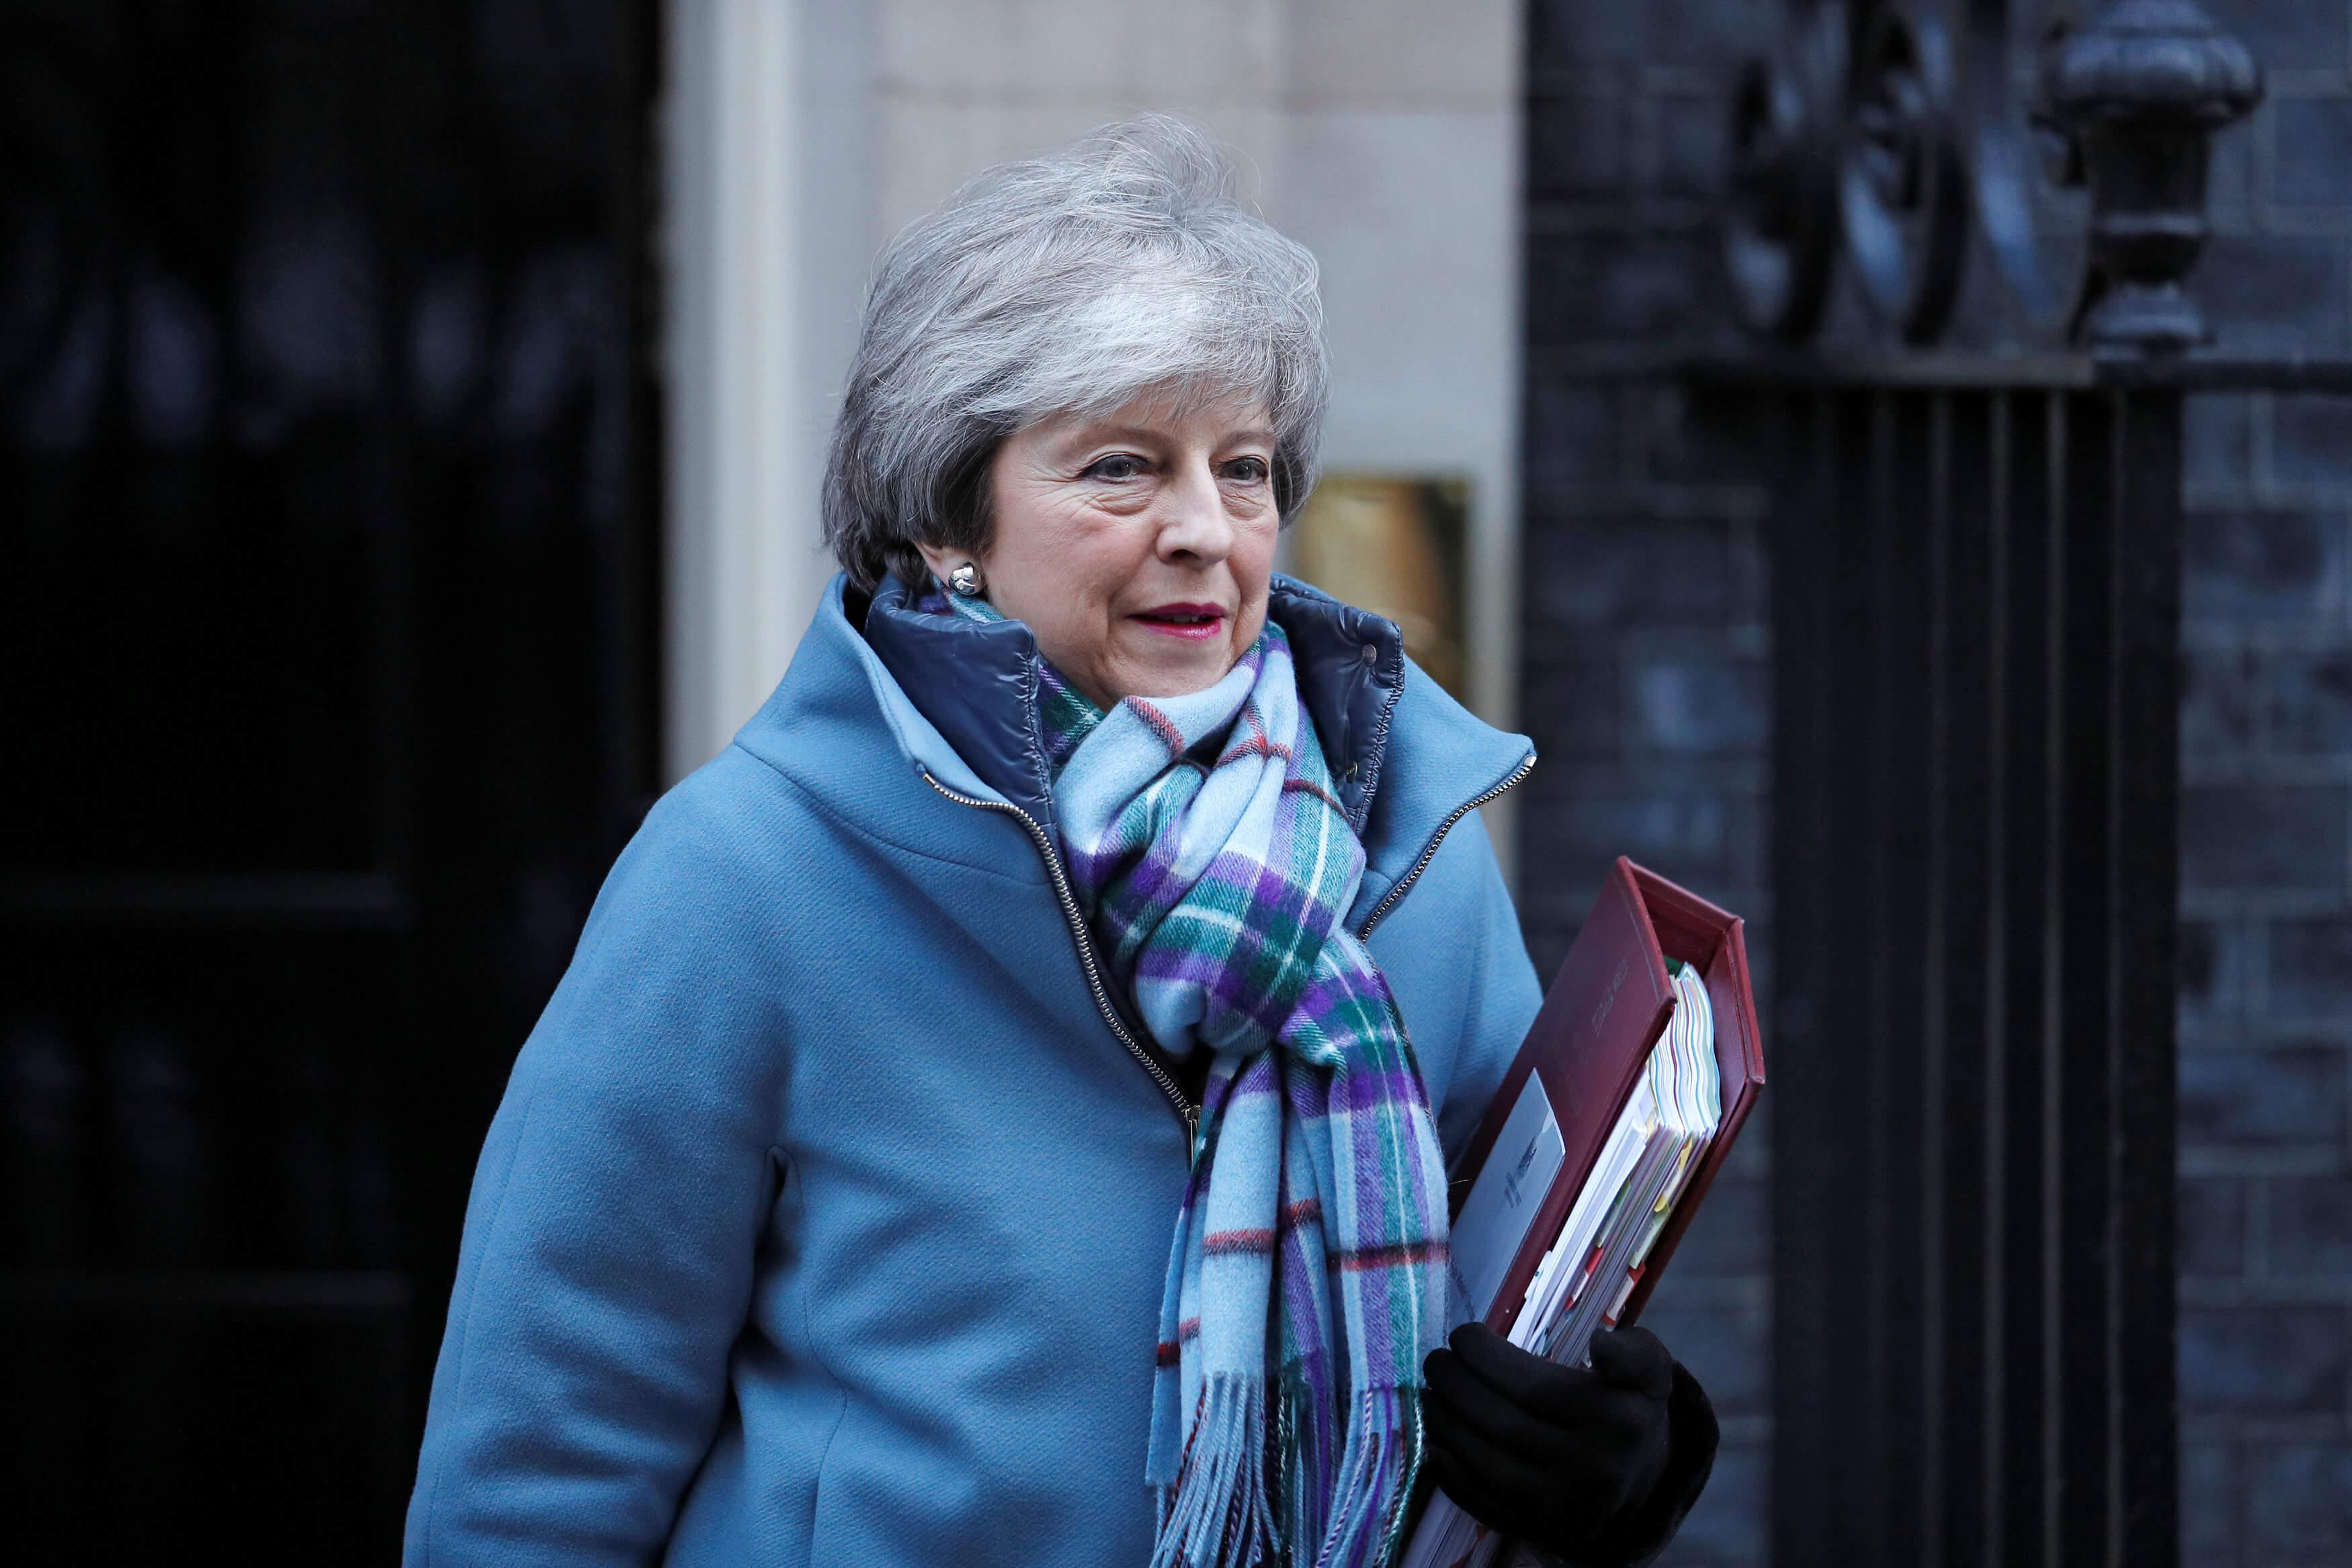 Brexit: Οι επόμενες κινήσεις μετά την απόφαση για επαναδιαπραγμάτευση με ΕΕ